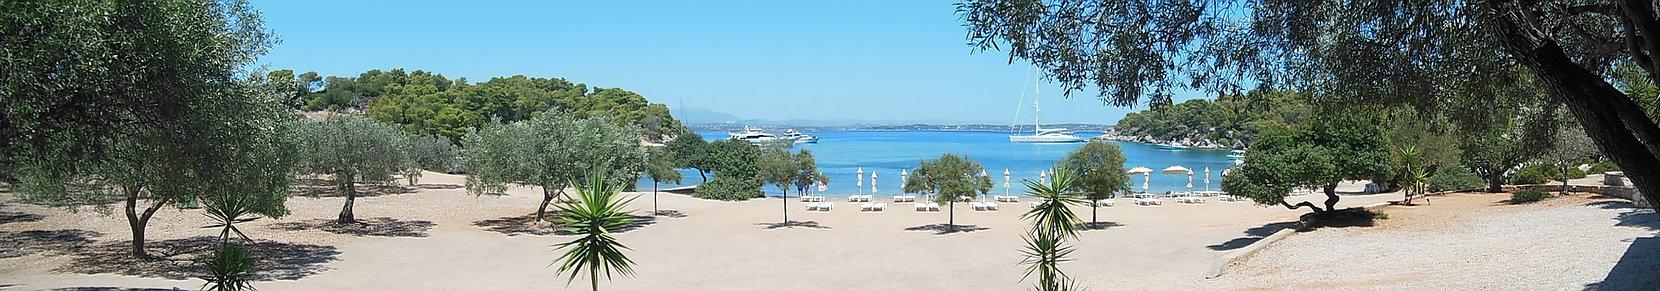 greece-paradise